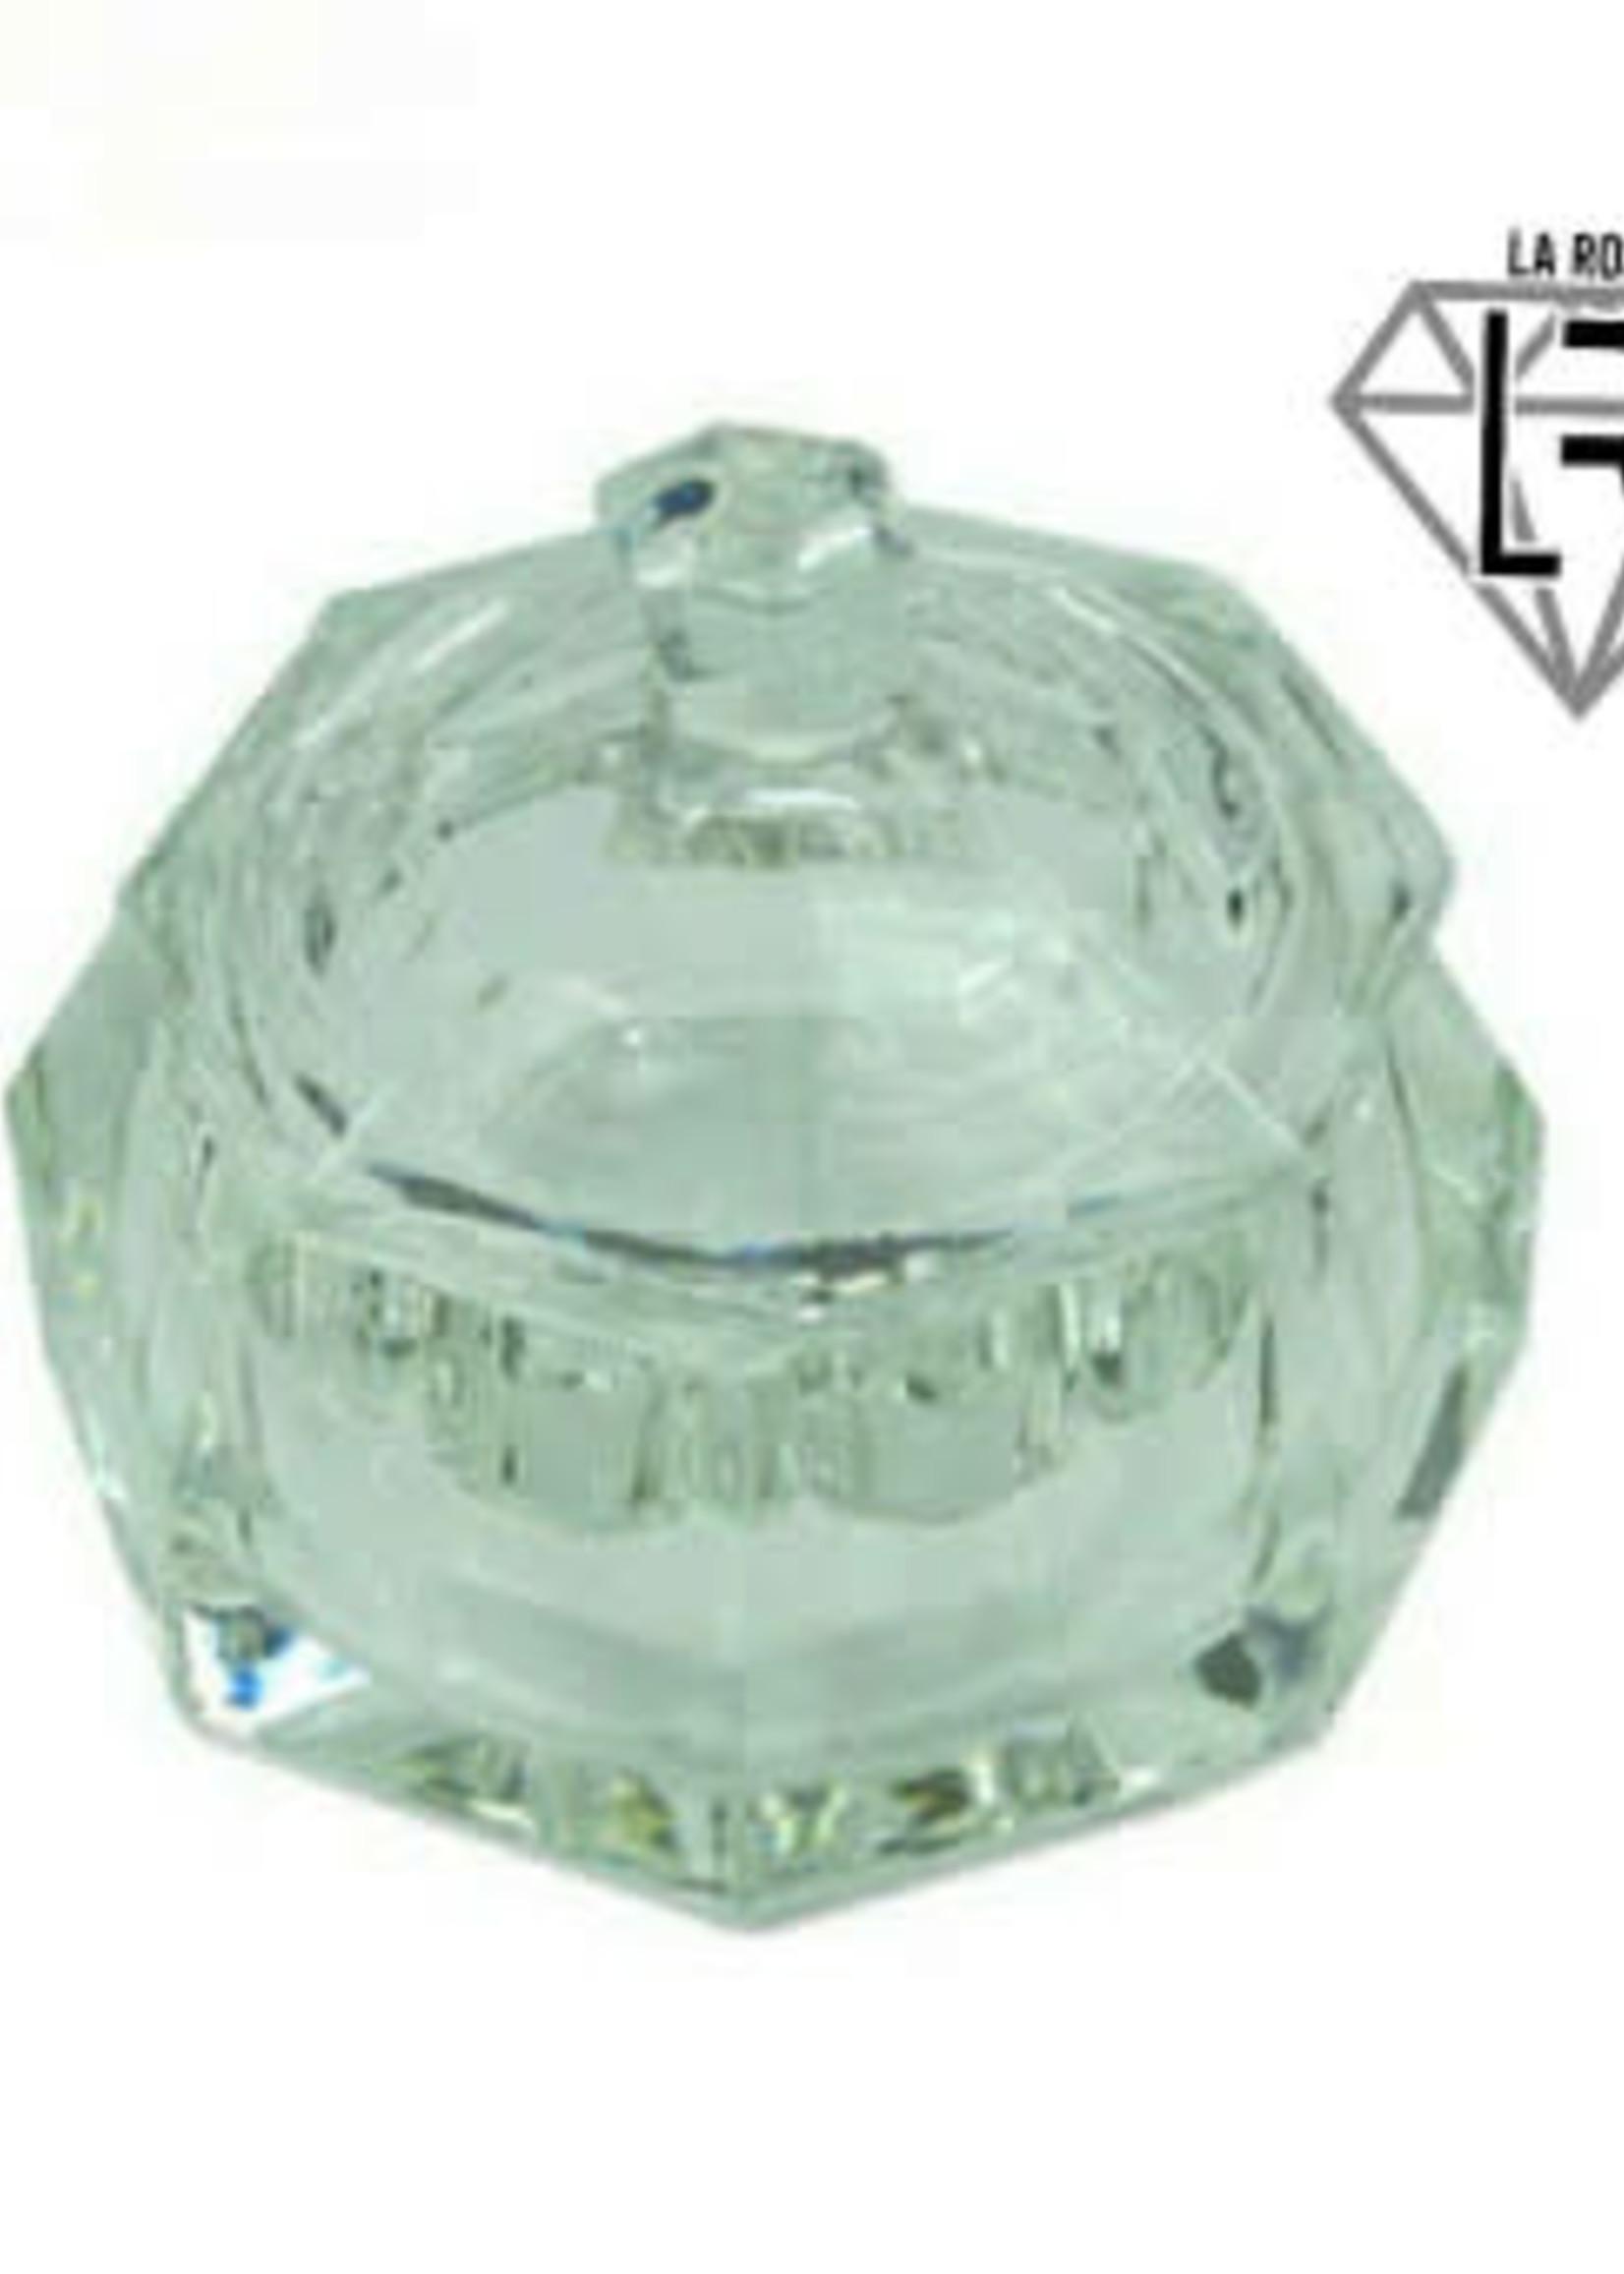 La Ross Large Diamond dappendish